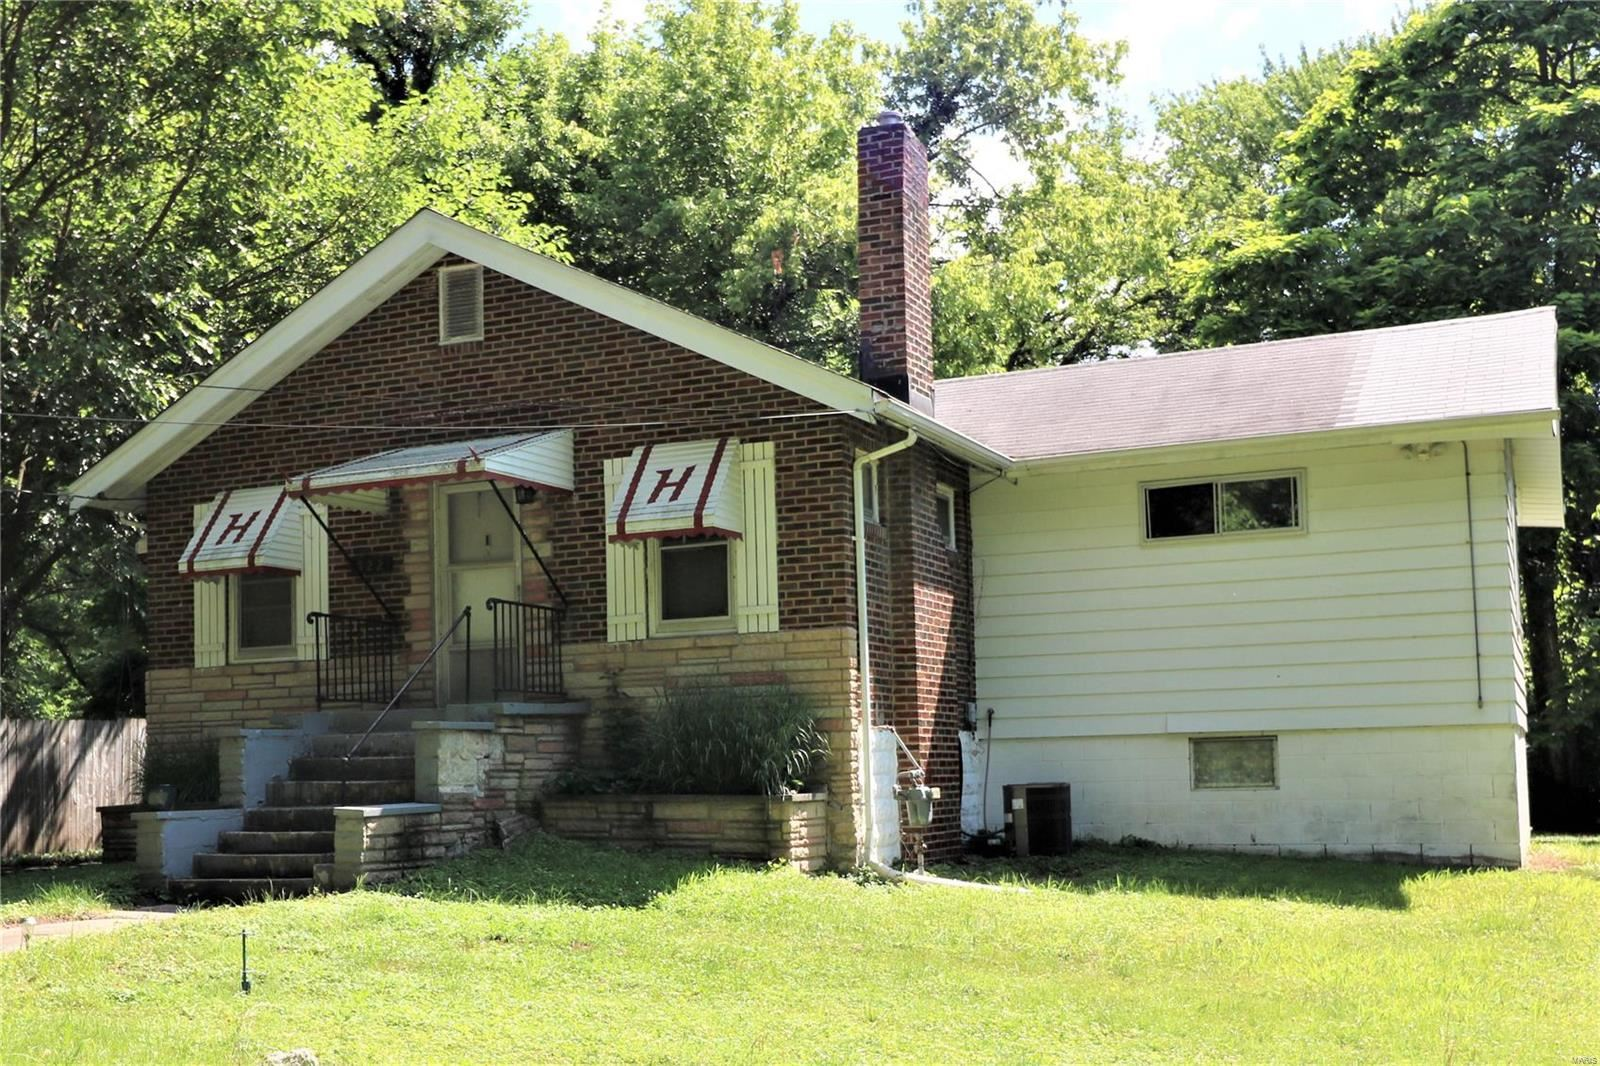 522 Hern Avenue, Ferguson, MO 63135 - MLS#: 20044037